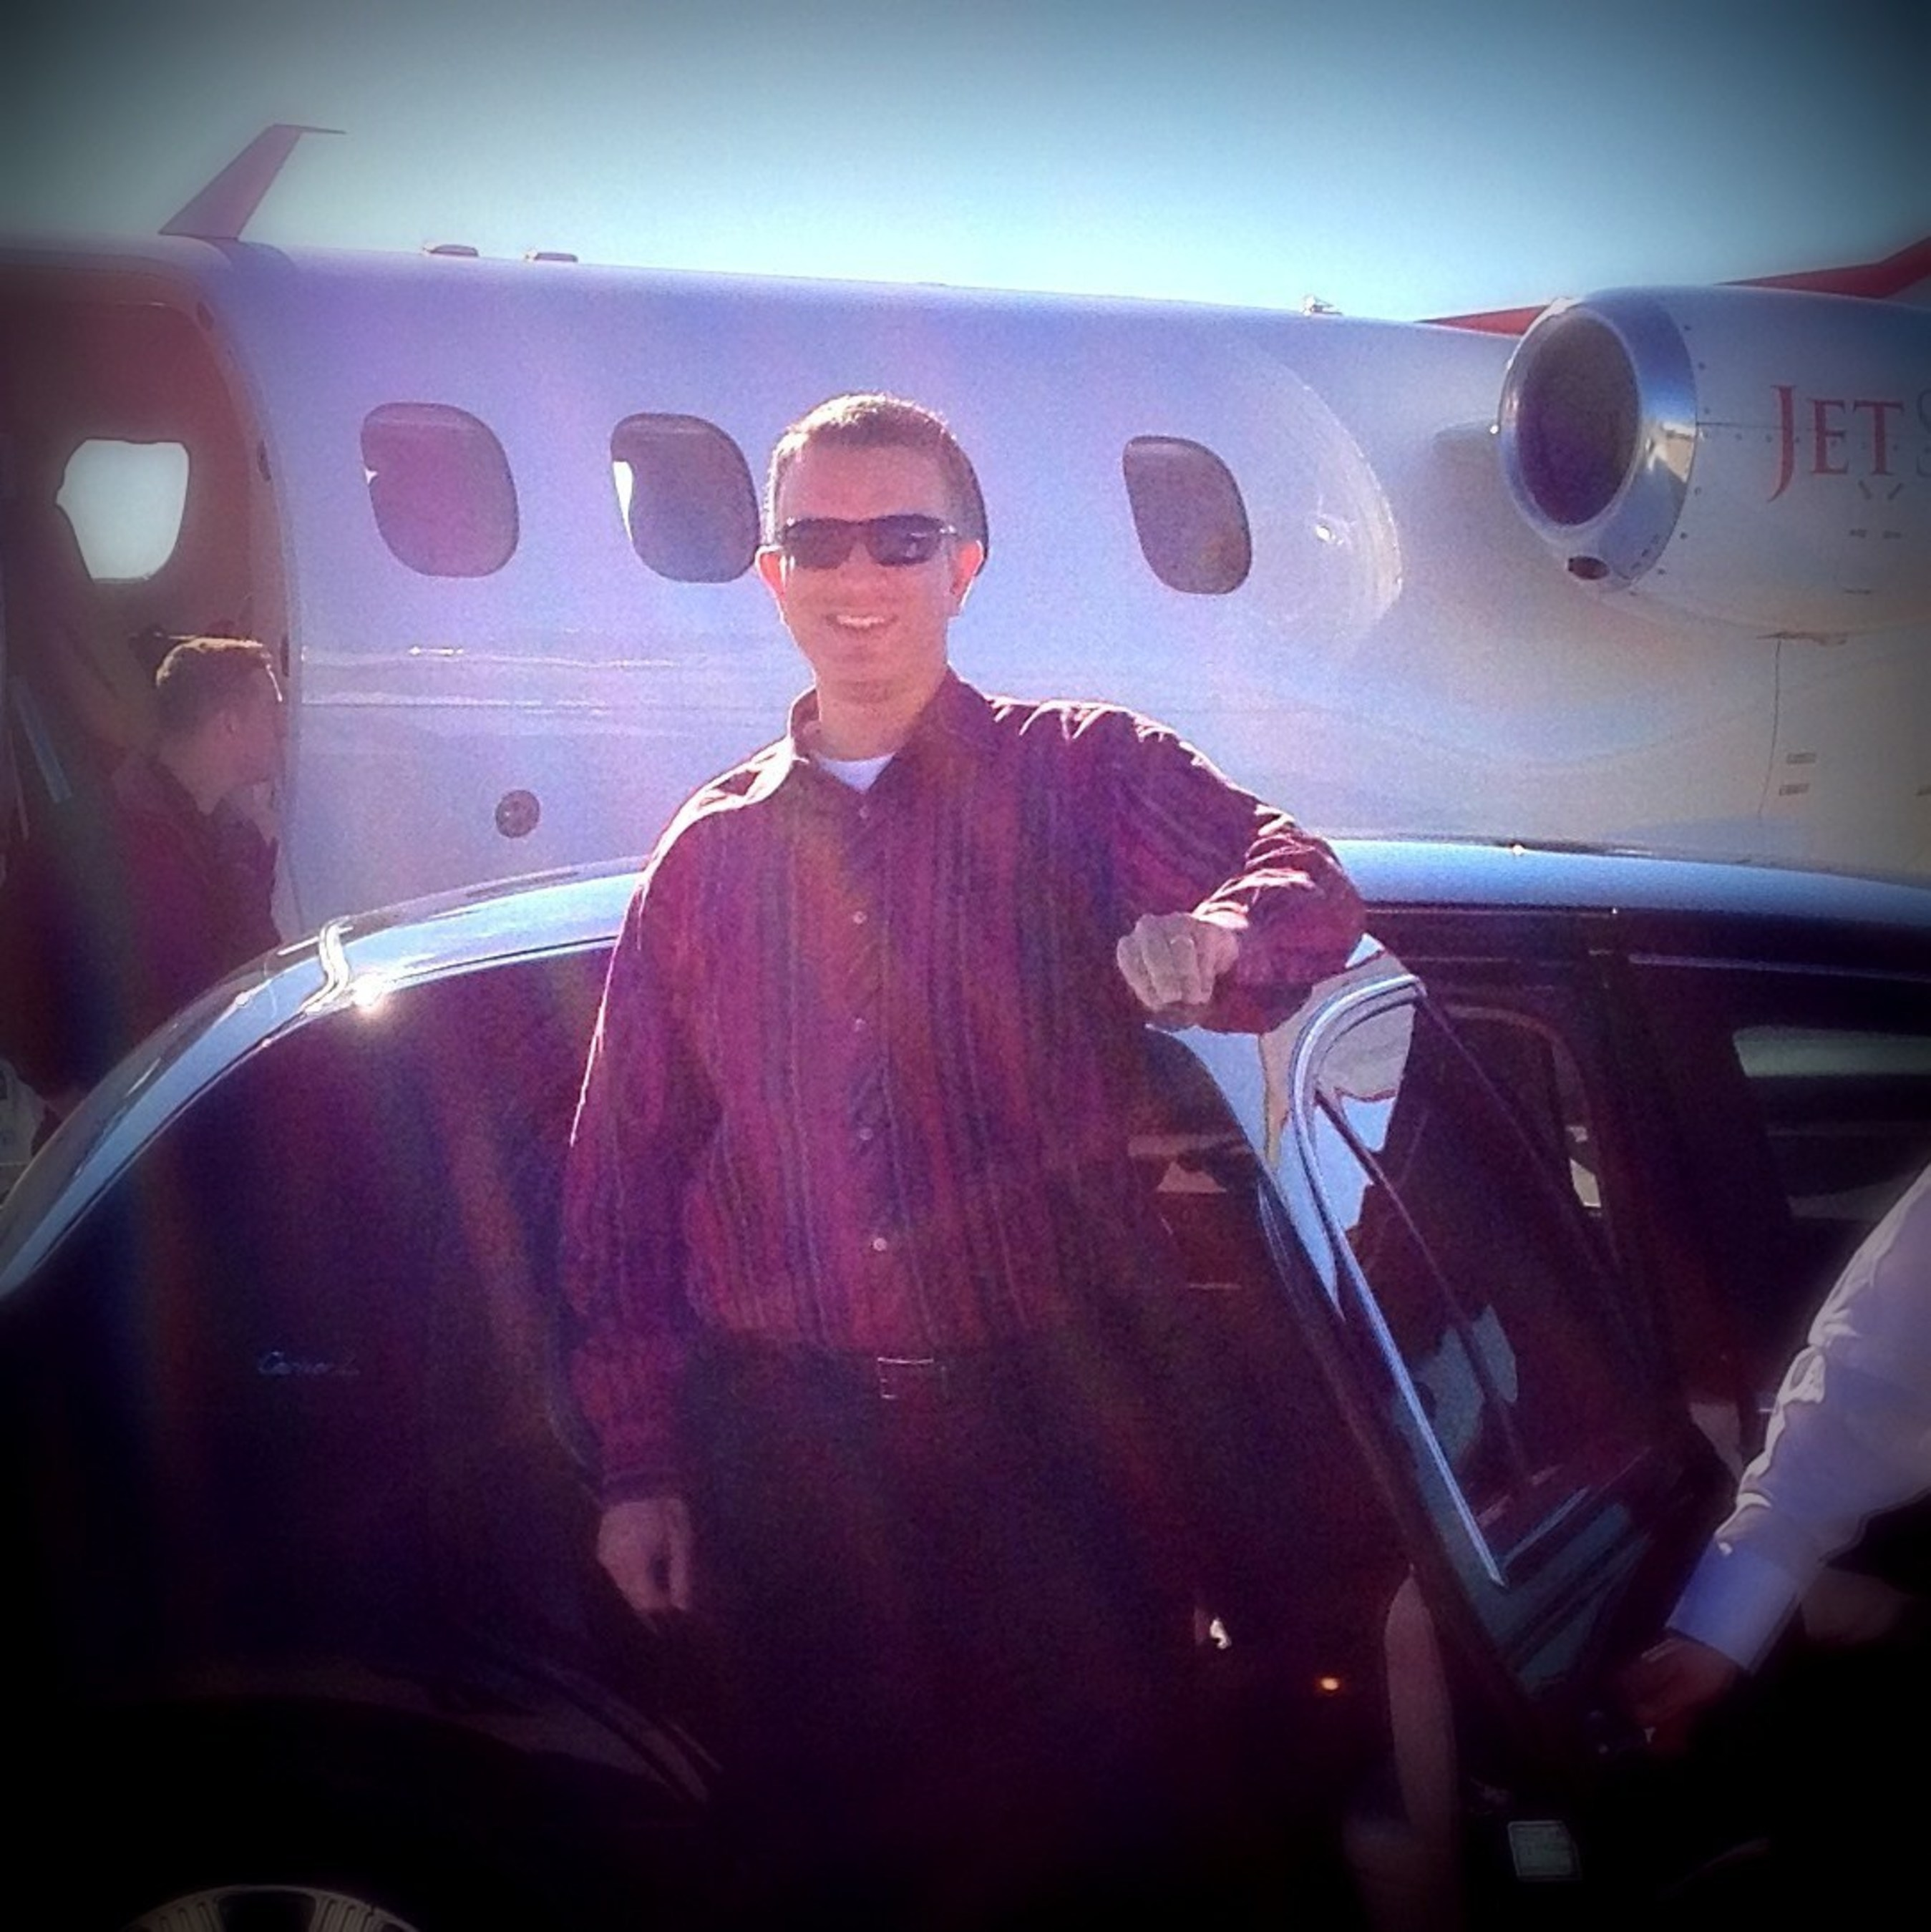 BlackJet Announces New Chief Marketing Officer